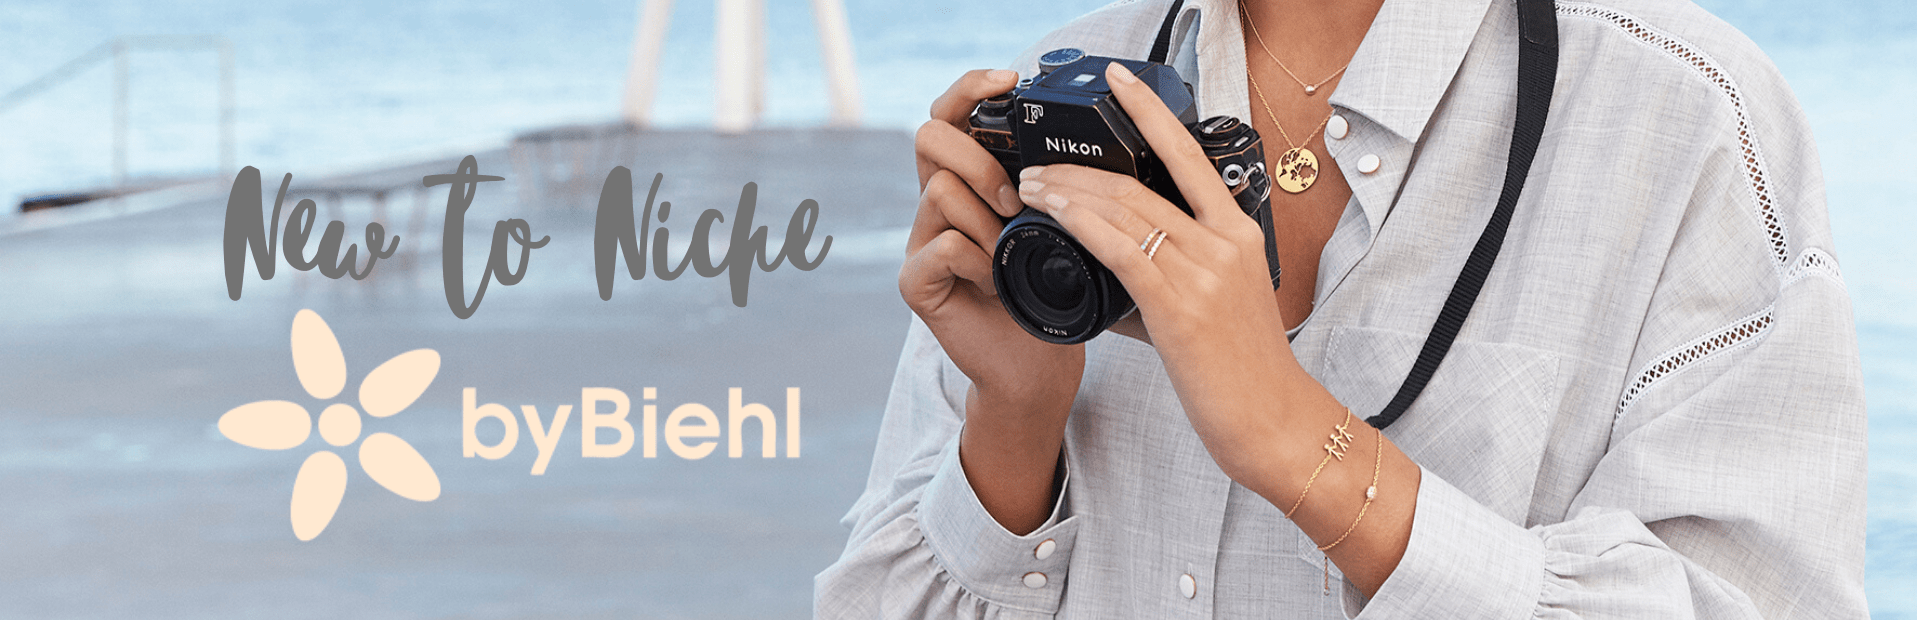 Buy byBiehl Jewellery Online